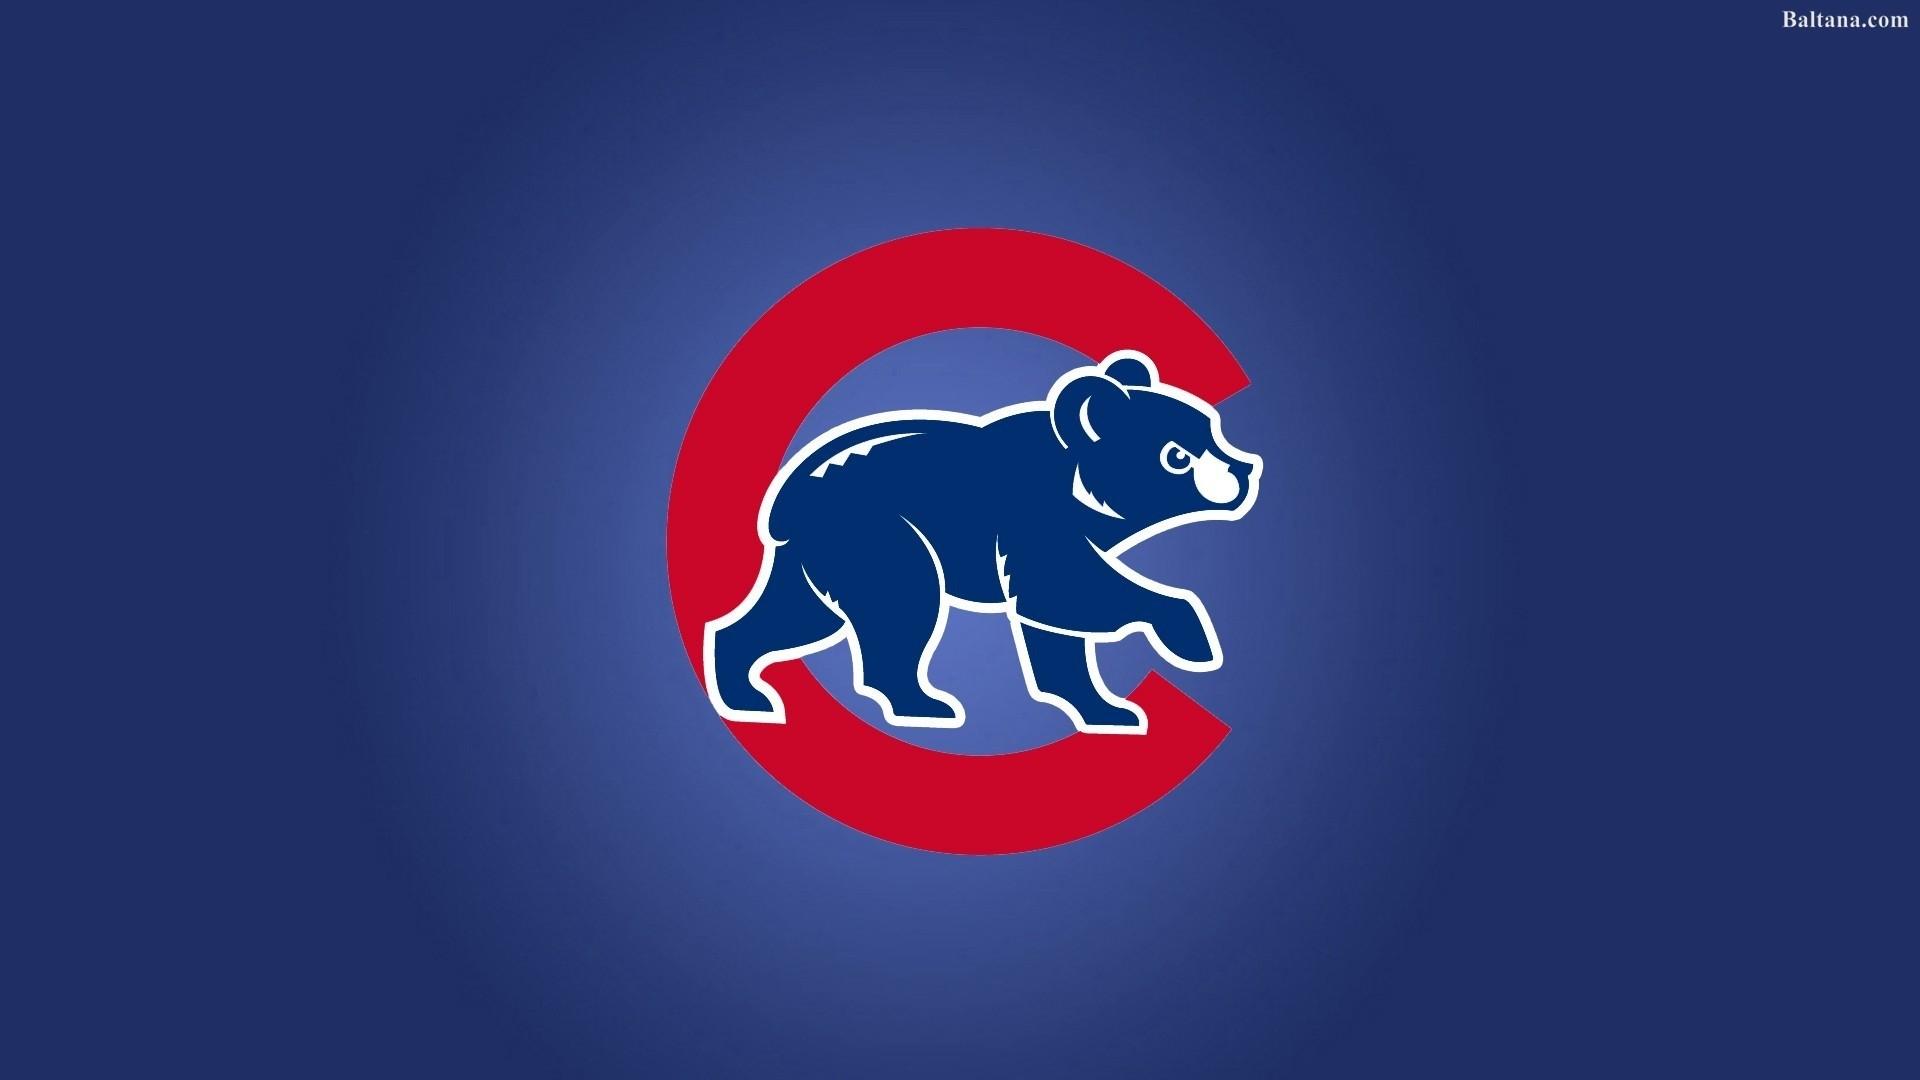 Cubs Free Wallpaper